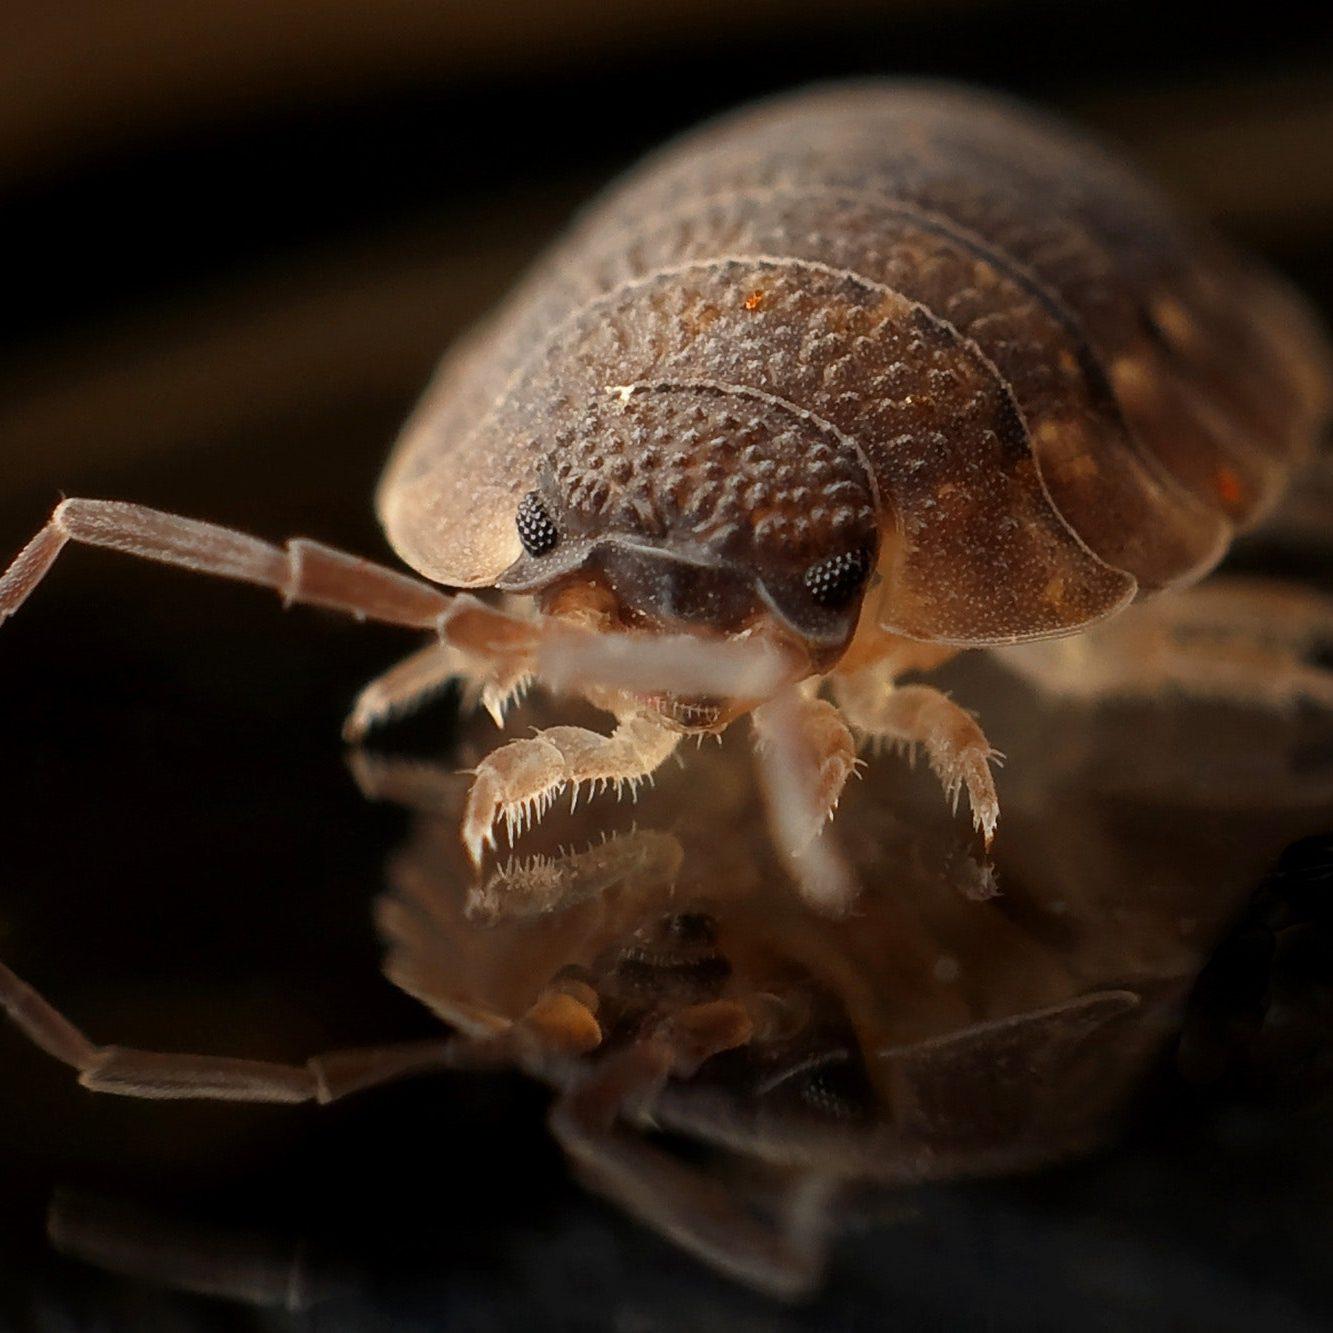 bed-bug-blood-sucker-bug-35804